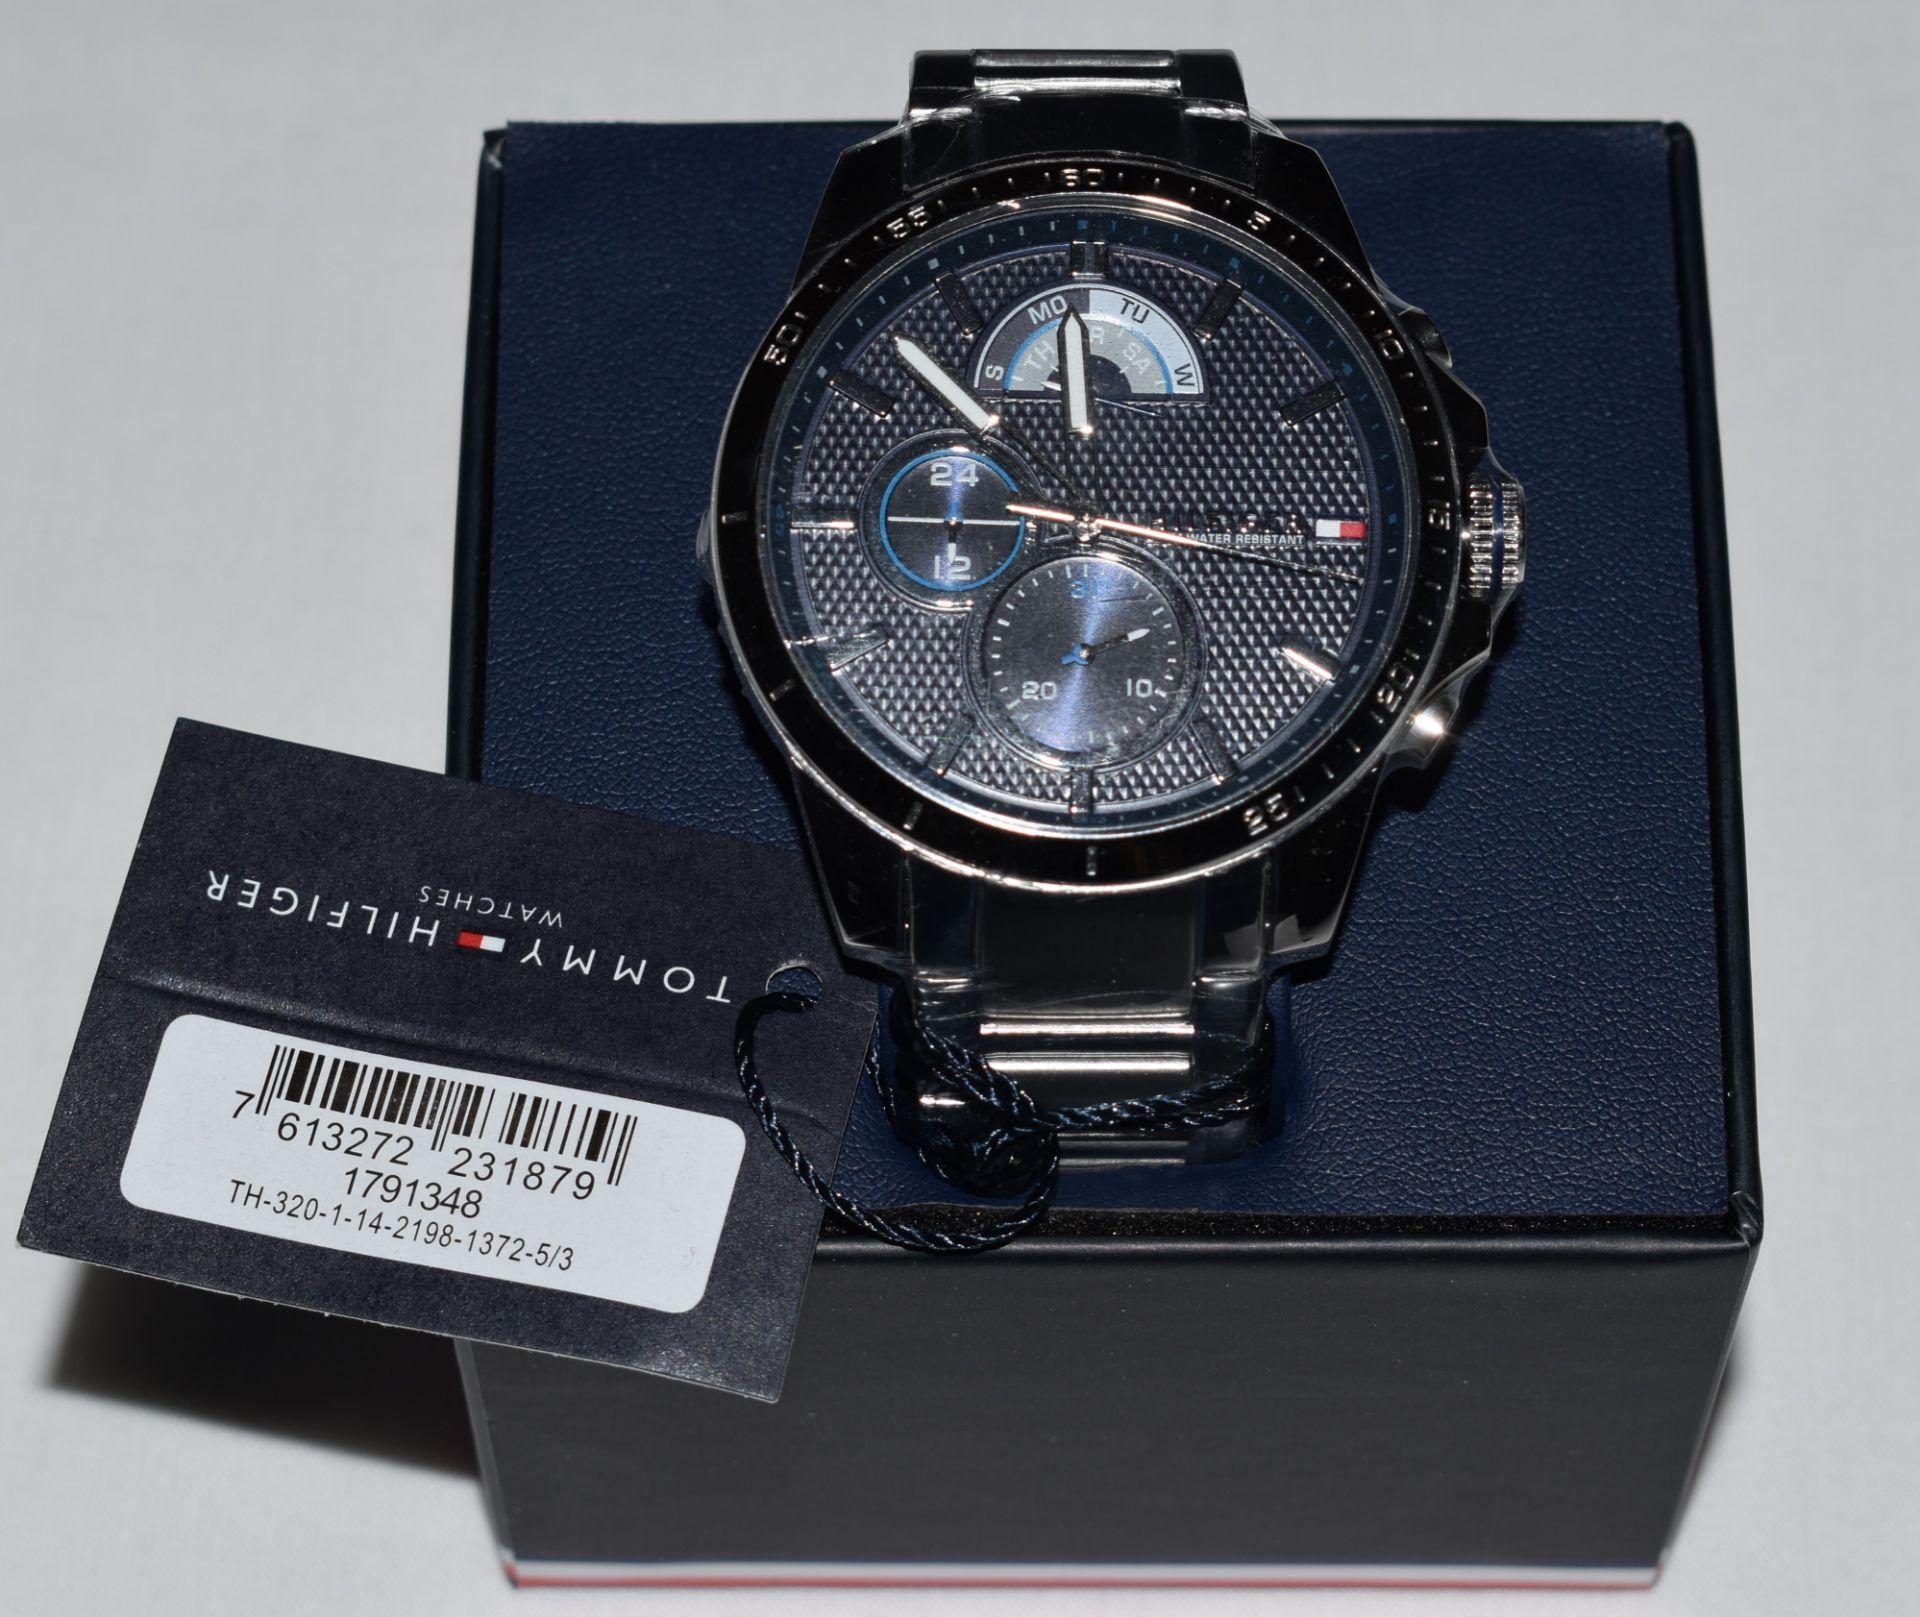 Tommy Hilfiger Men's Watch 1791348 - Image 2 of 3